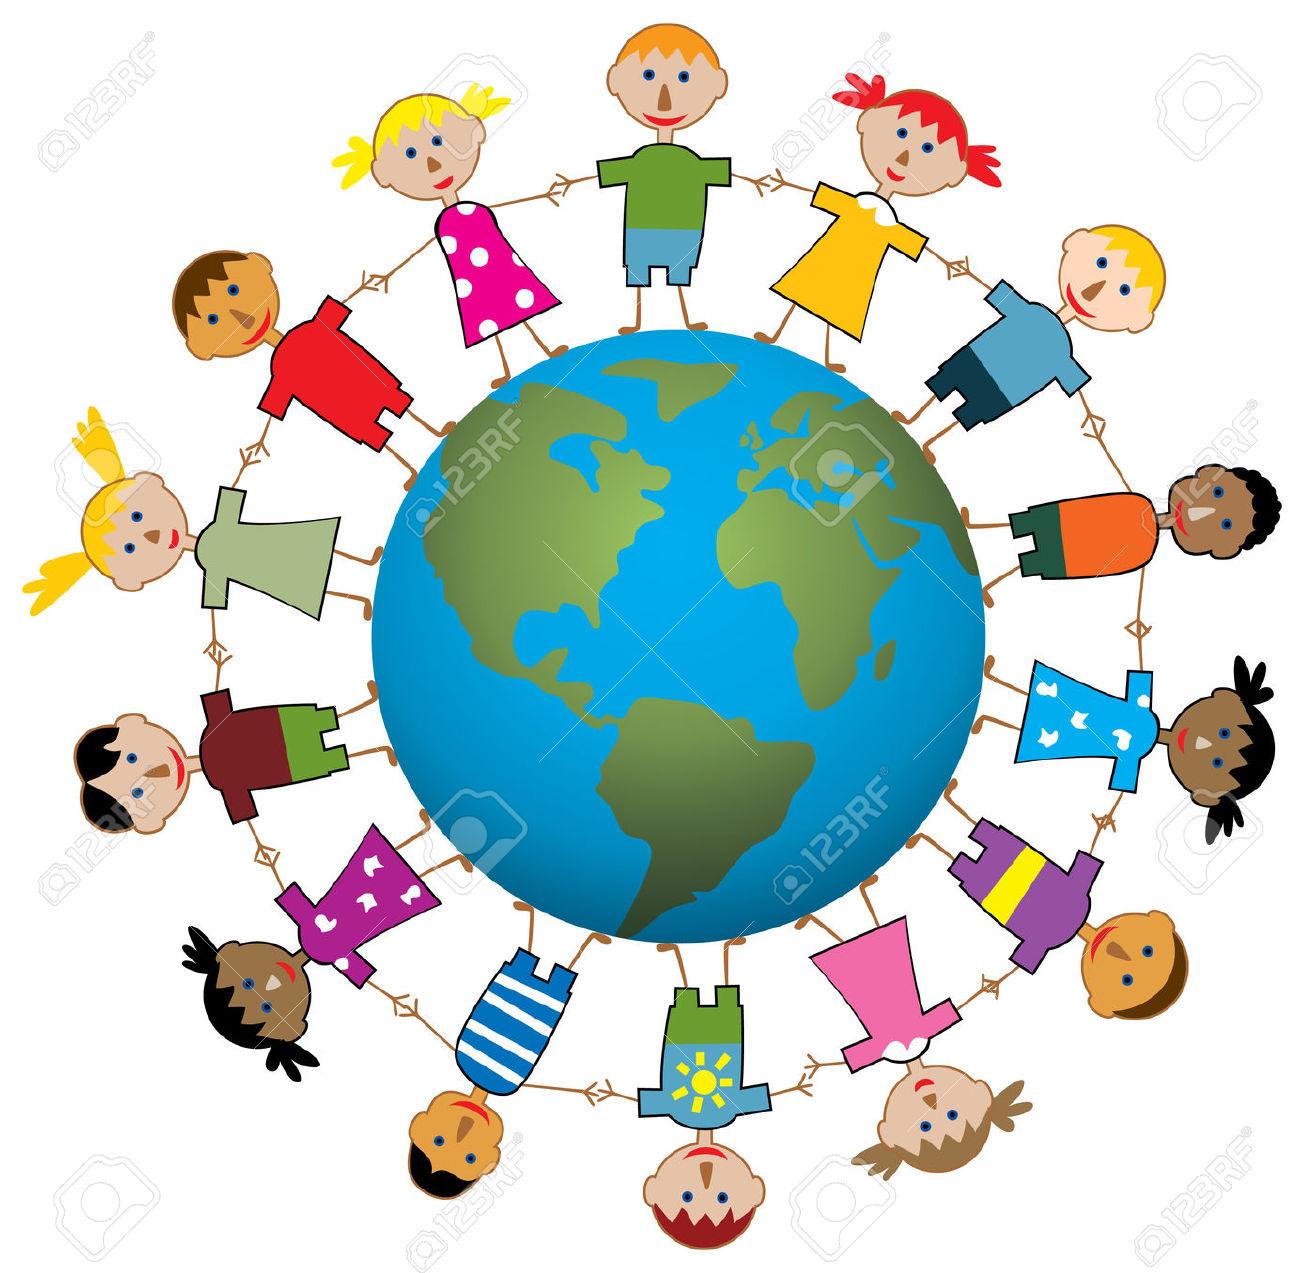 children around the world .-children around the world .-16